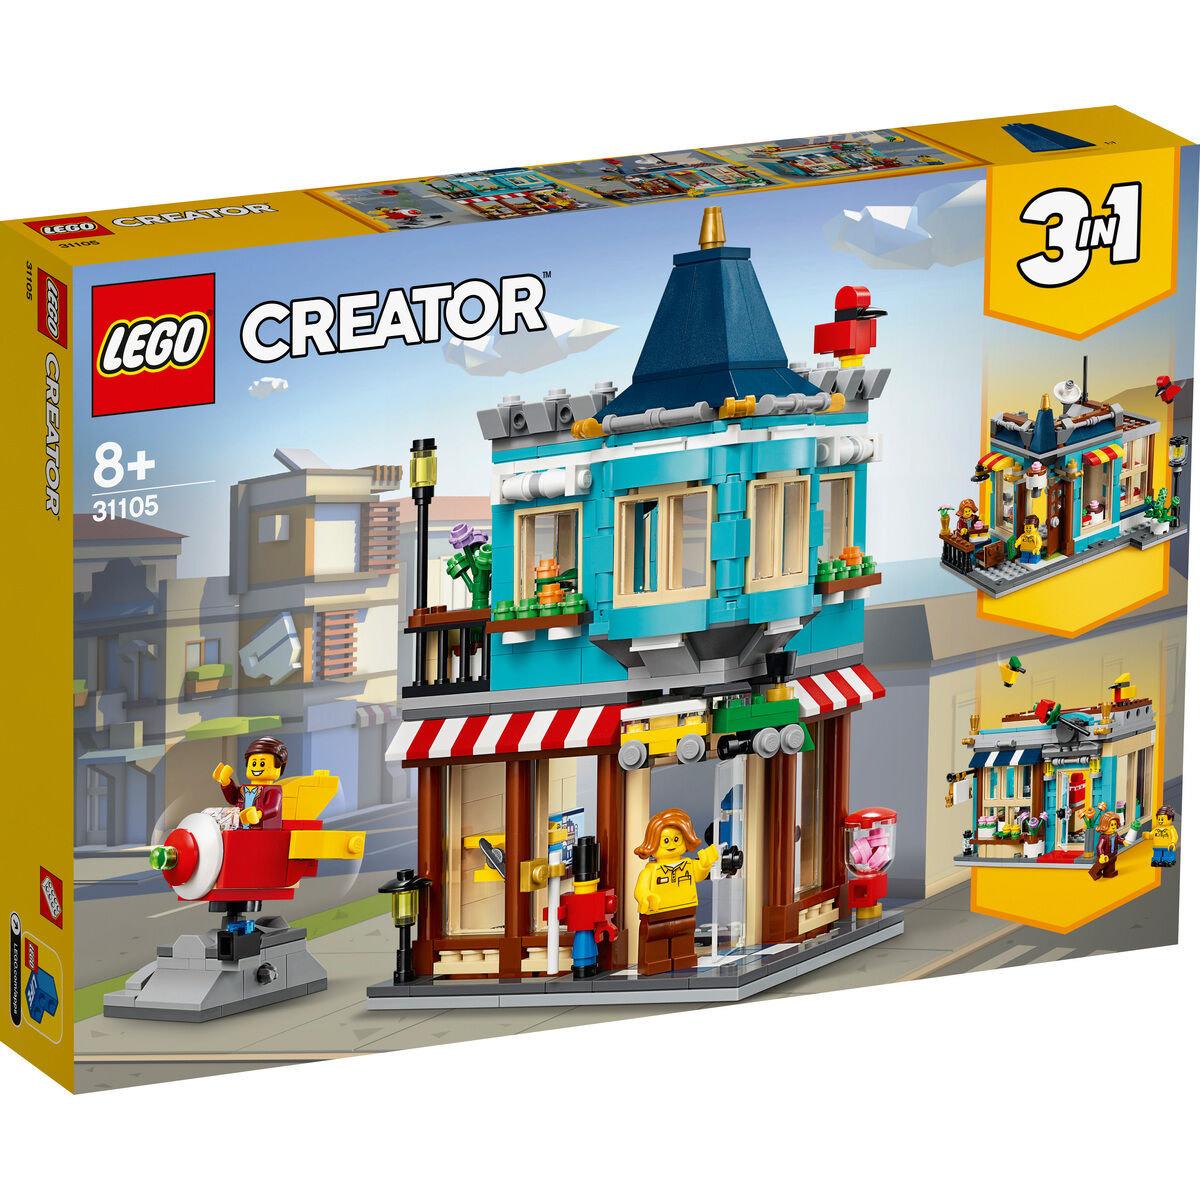 Lego Creator 3in1 Spielzeugladen 31105 oder Burger-Monster-Truck 31104